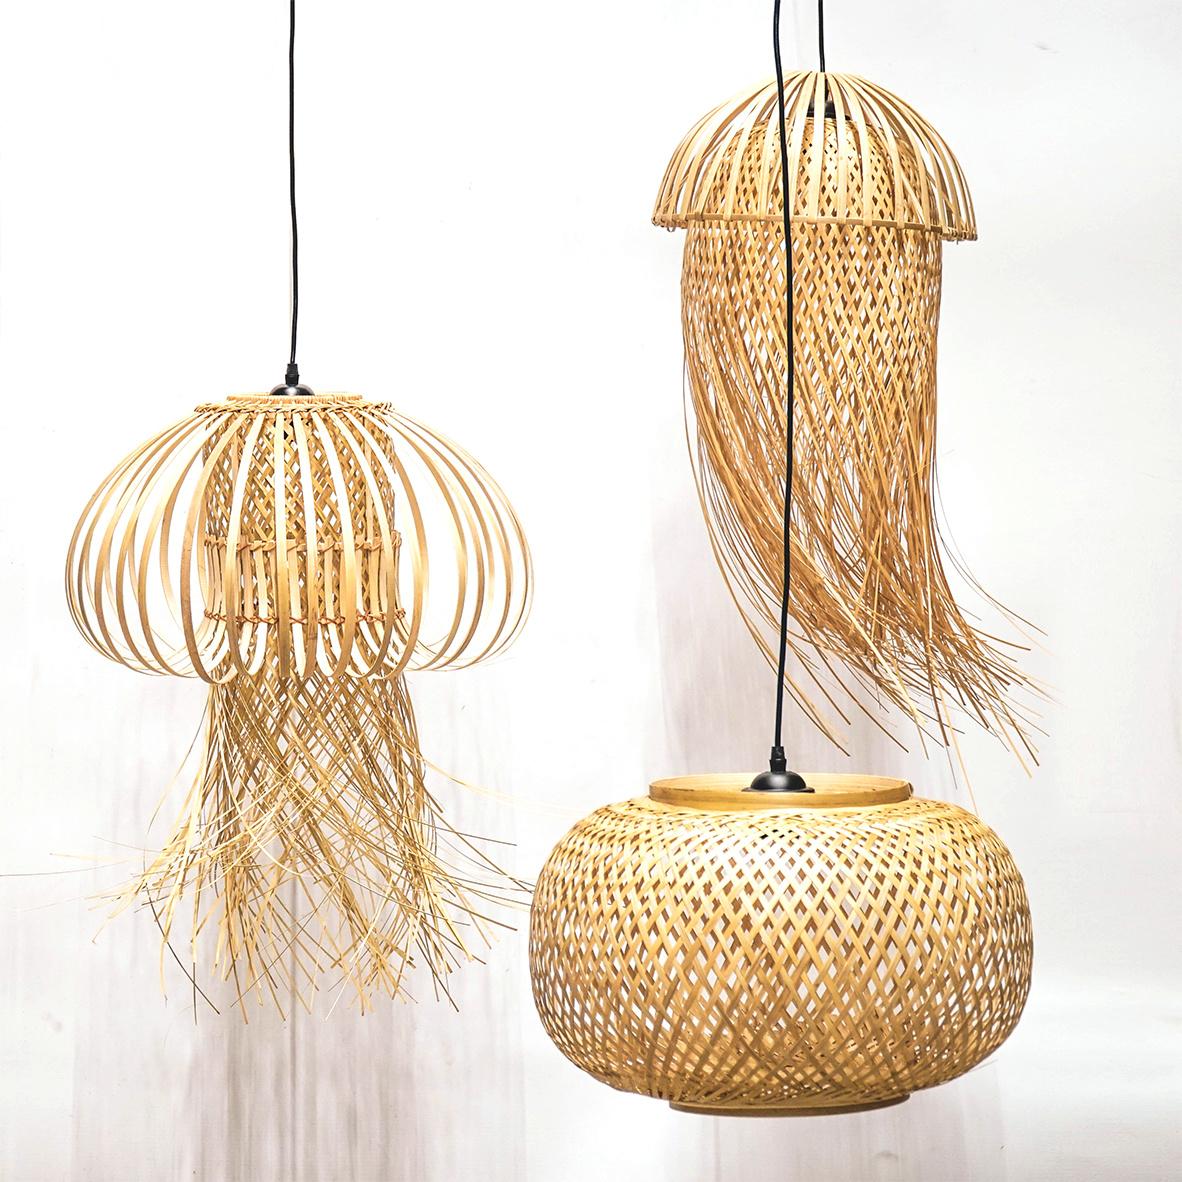 Design hanglamp van bamboe hout